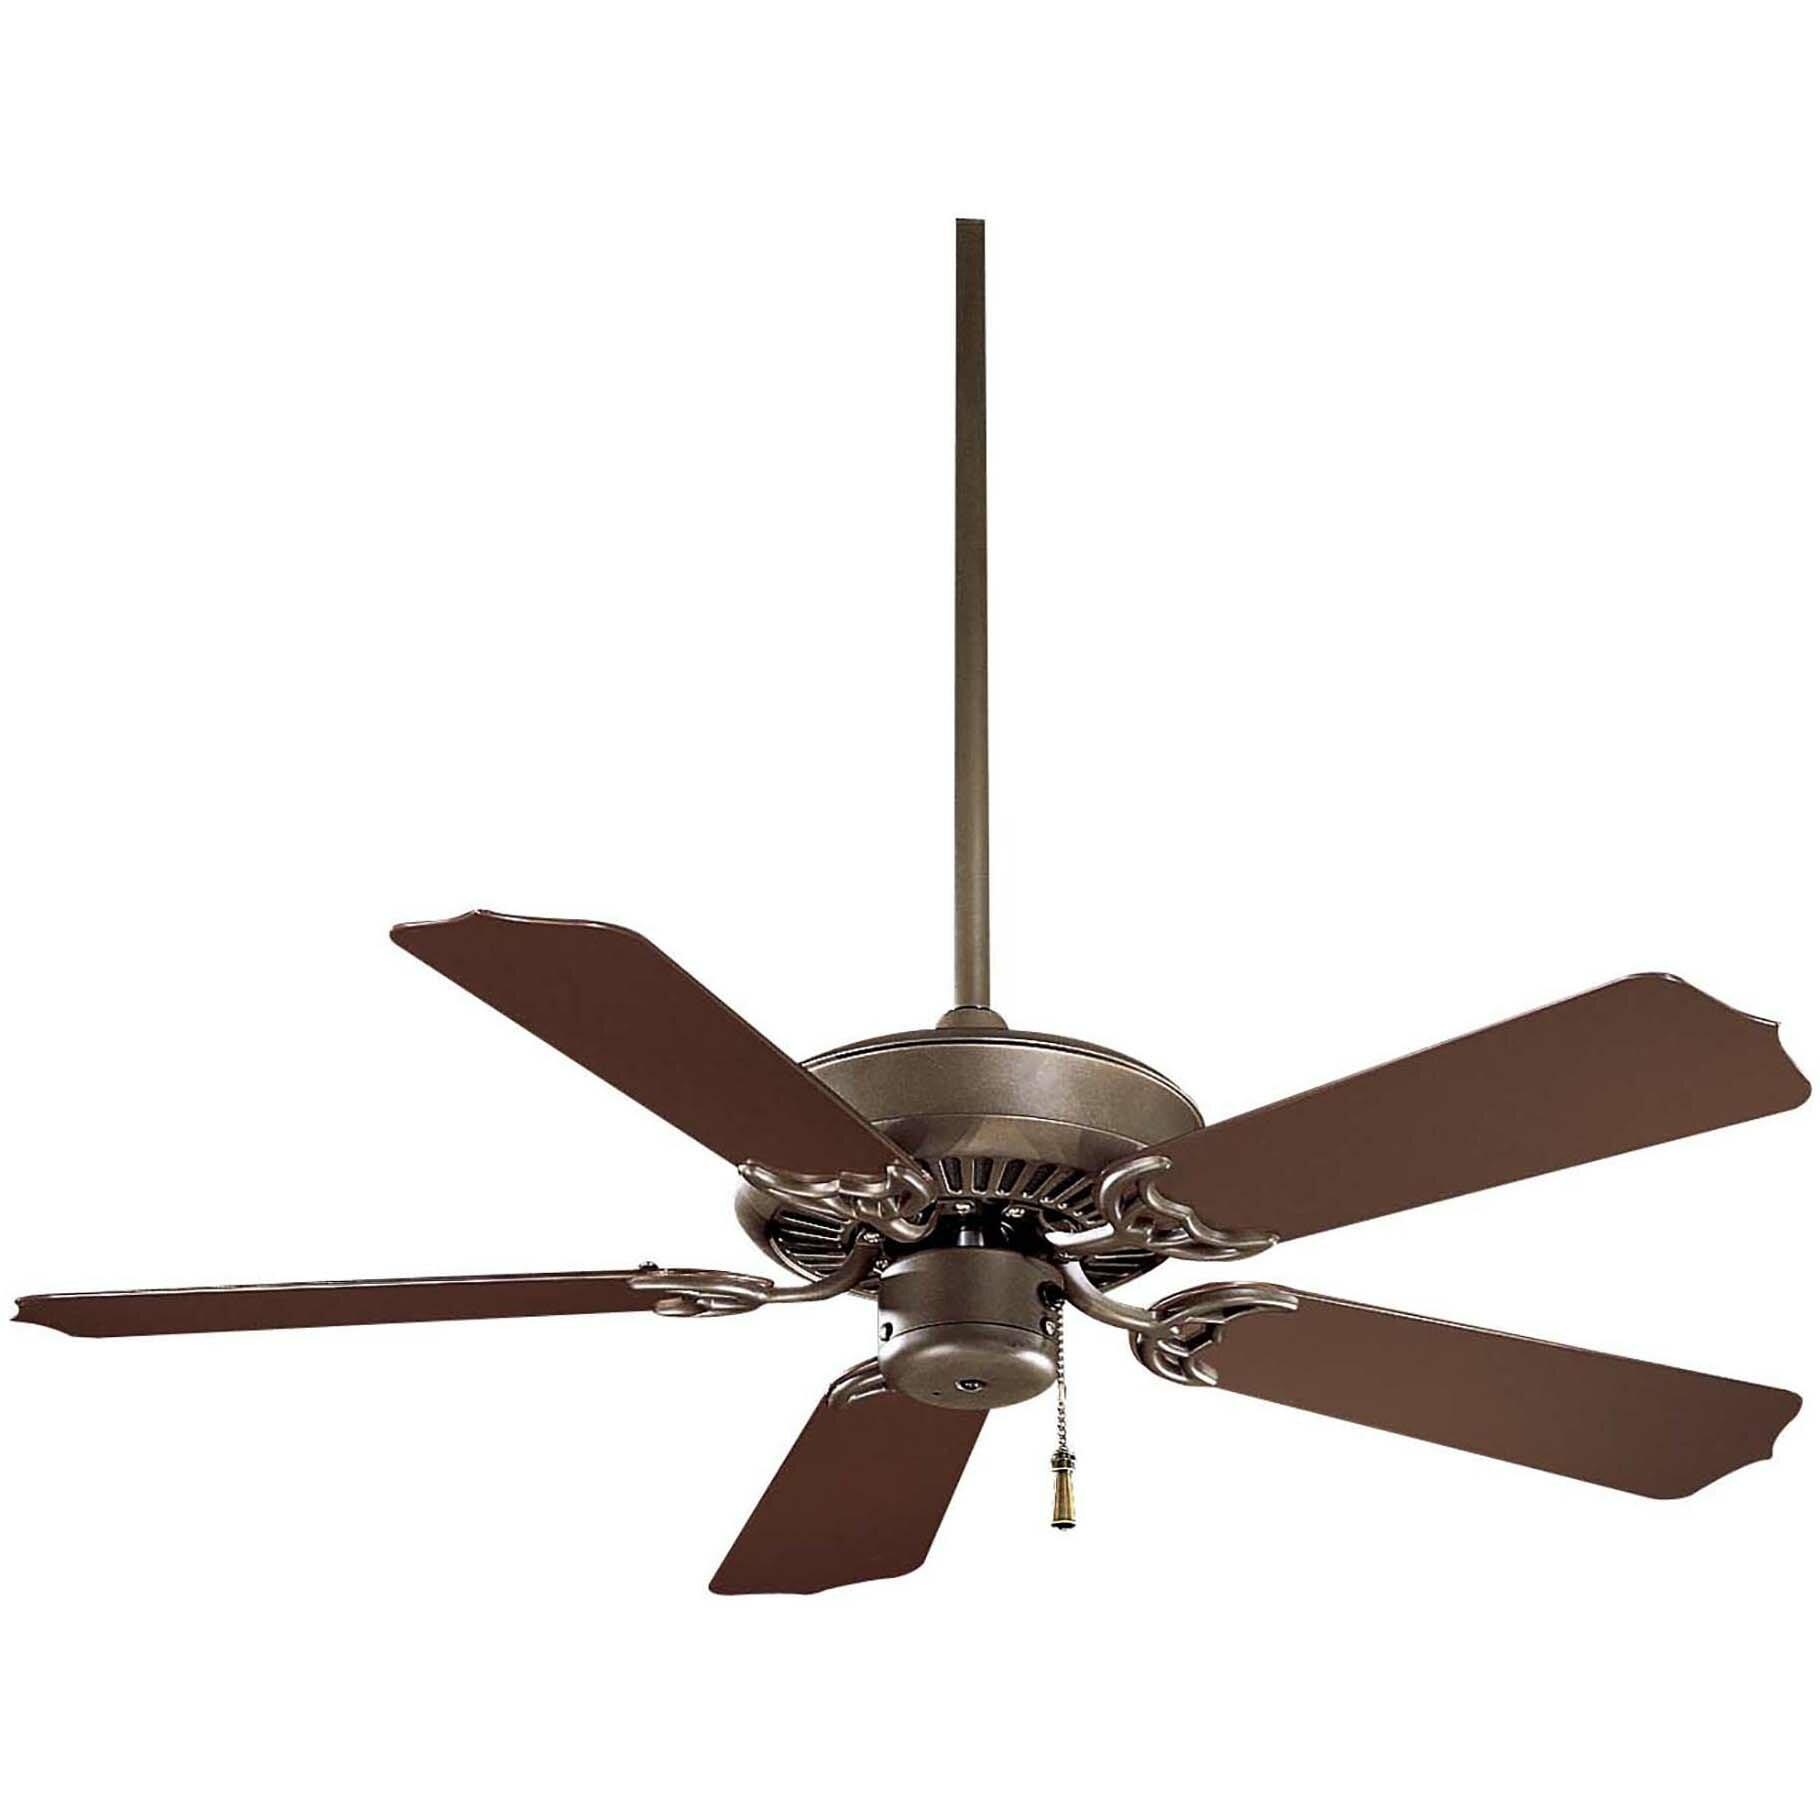 "Minka Aire 42"" Sundance 5 Blade Indoor / Outdoor Ceiling"